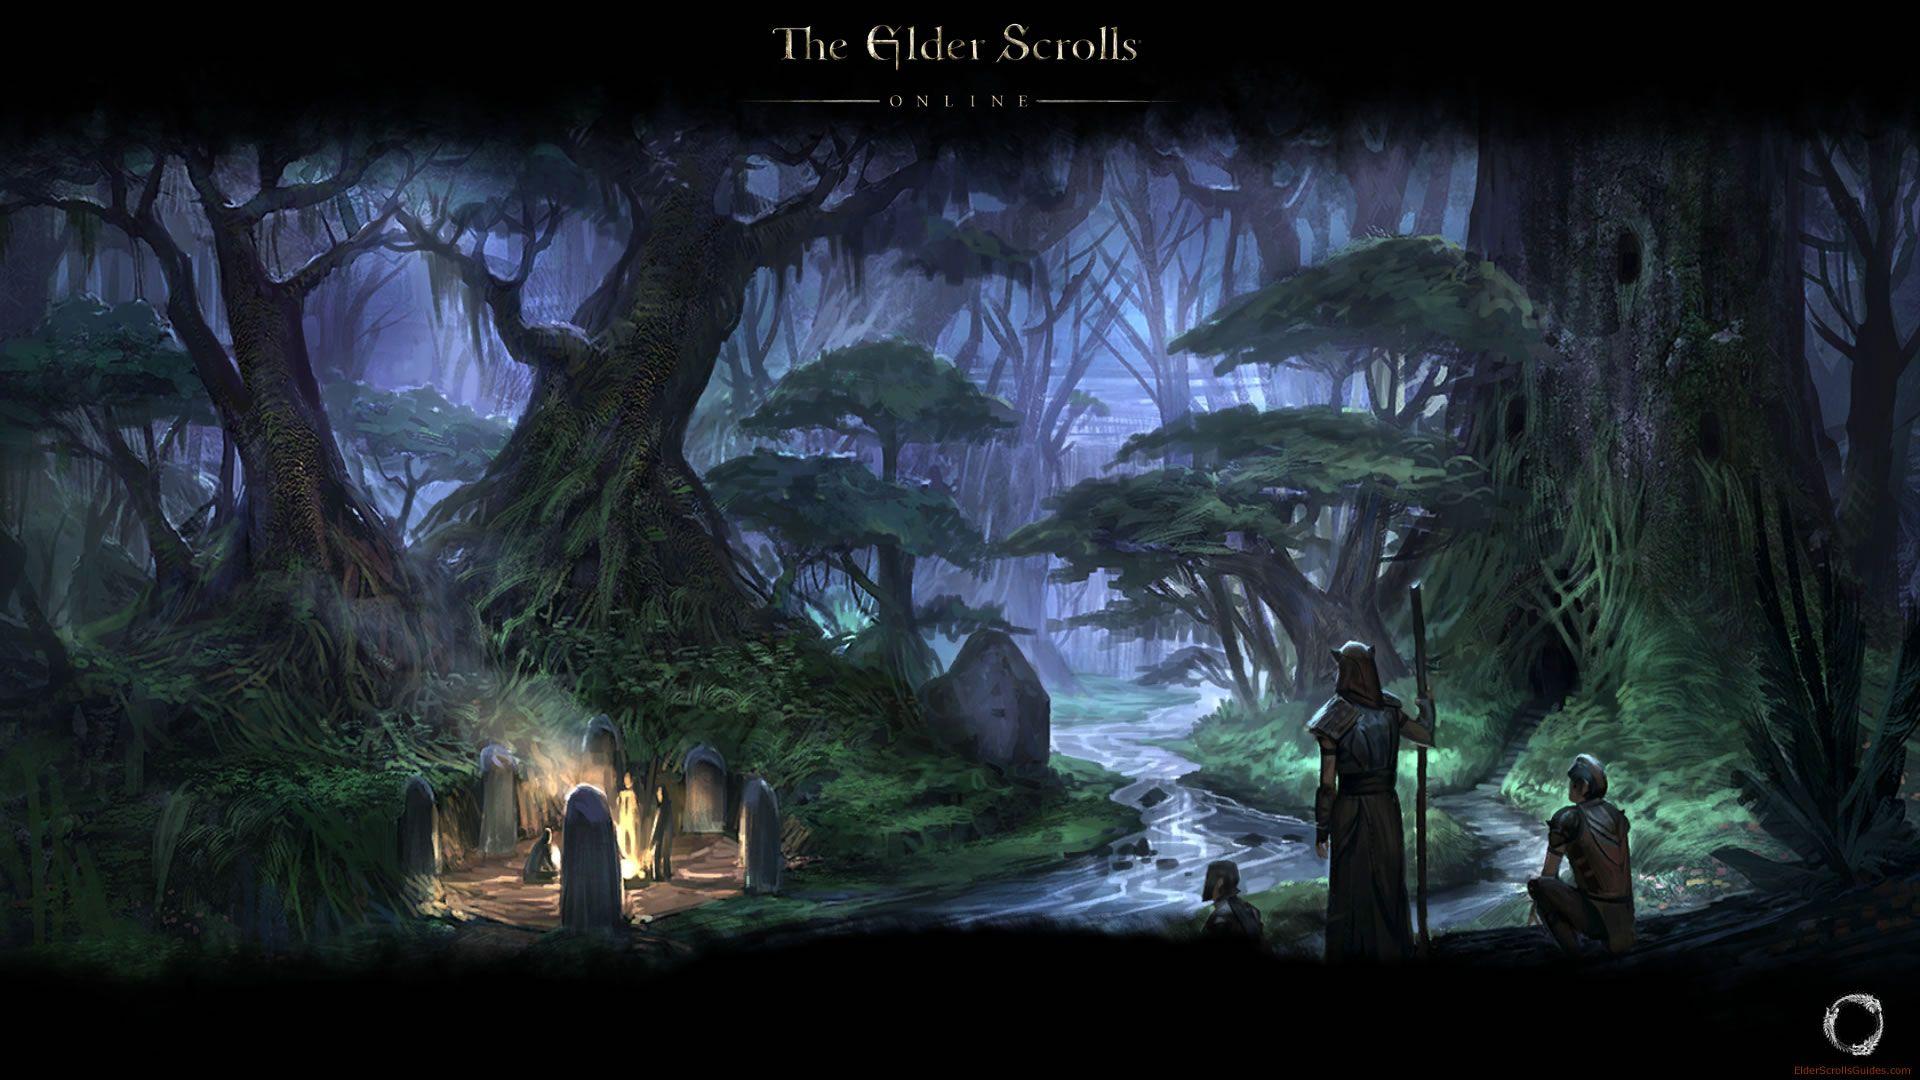 The Elder Scrolls Online Hd Desktop Wallpaper Widescreen